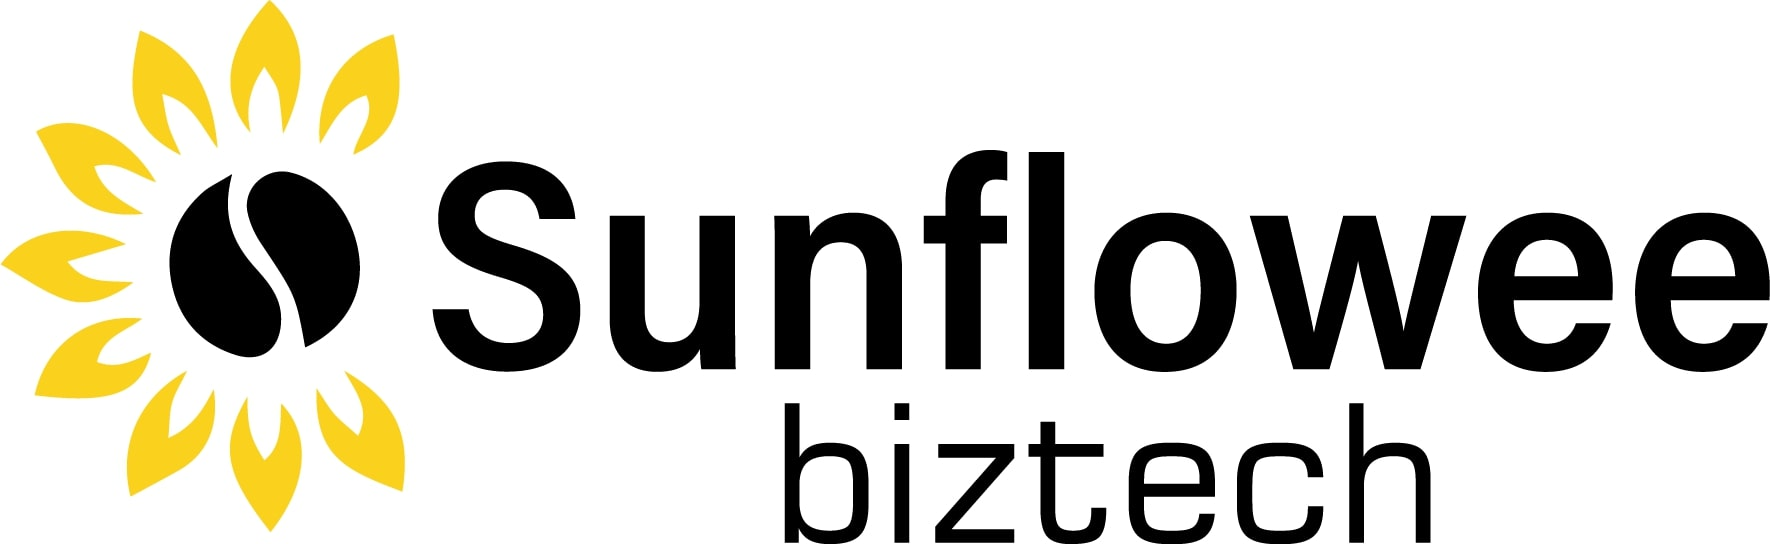 Sunflowee Biztech Private Limited Logo